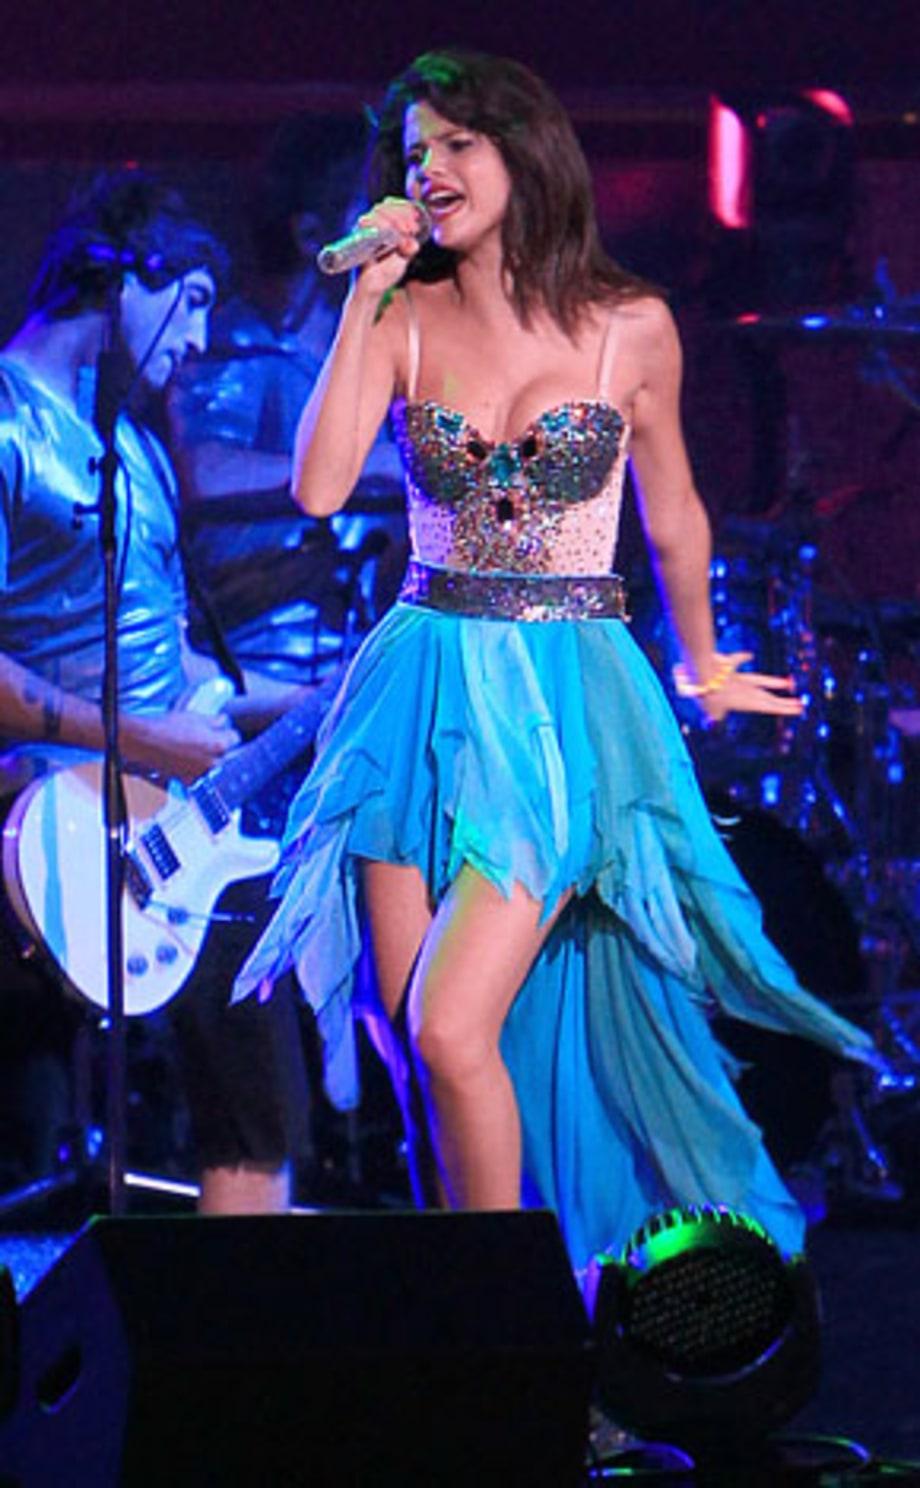 Фото платье на концерт 3